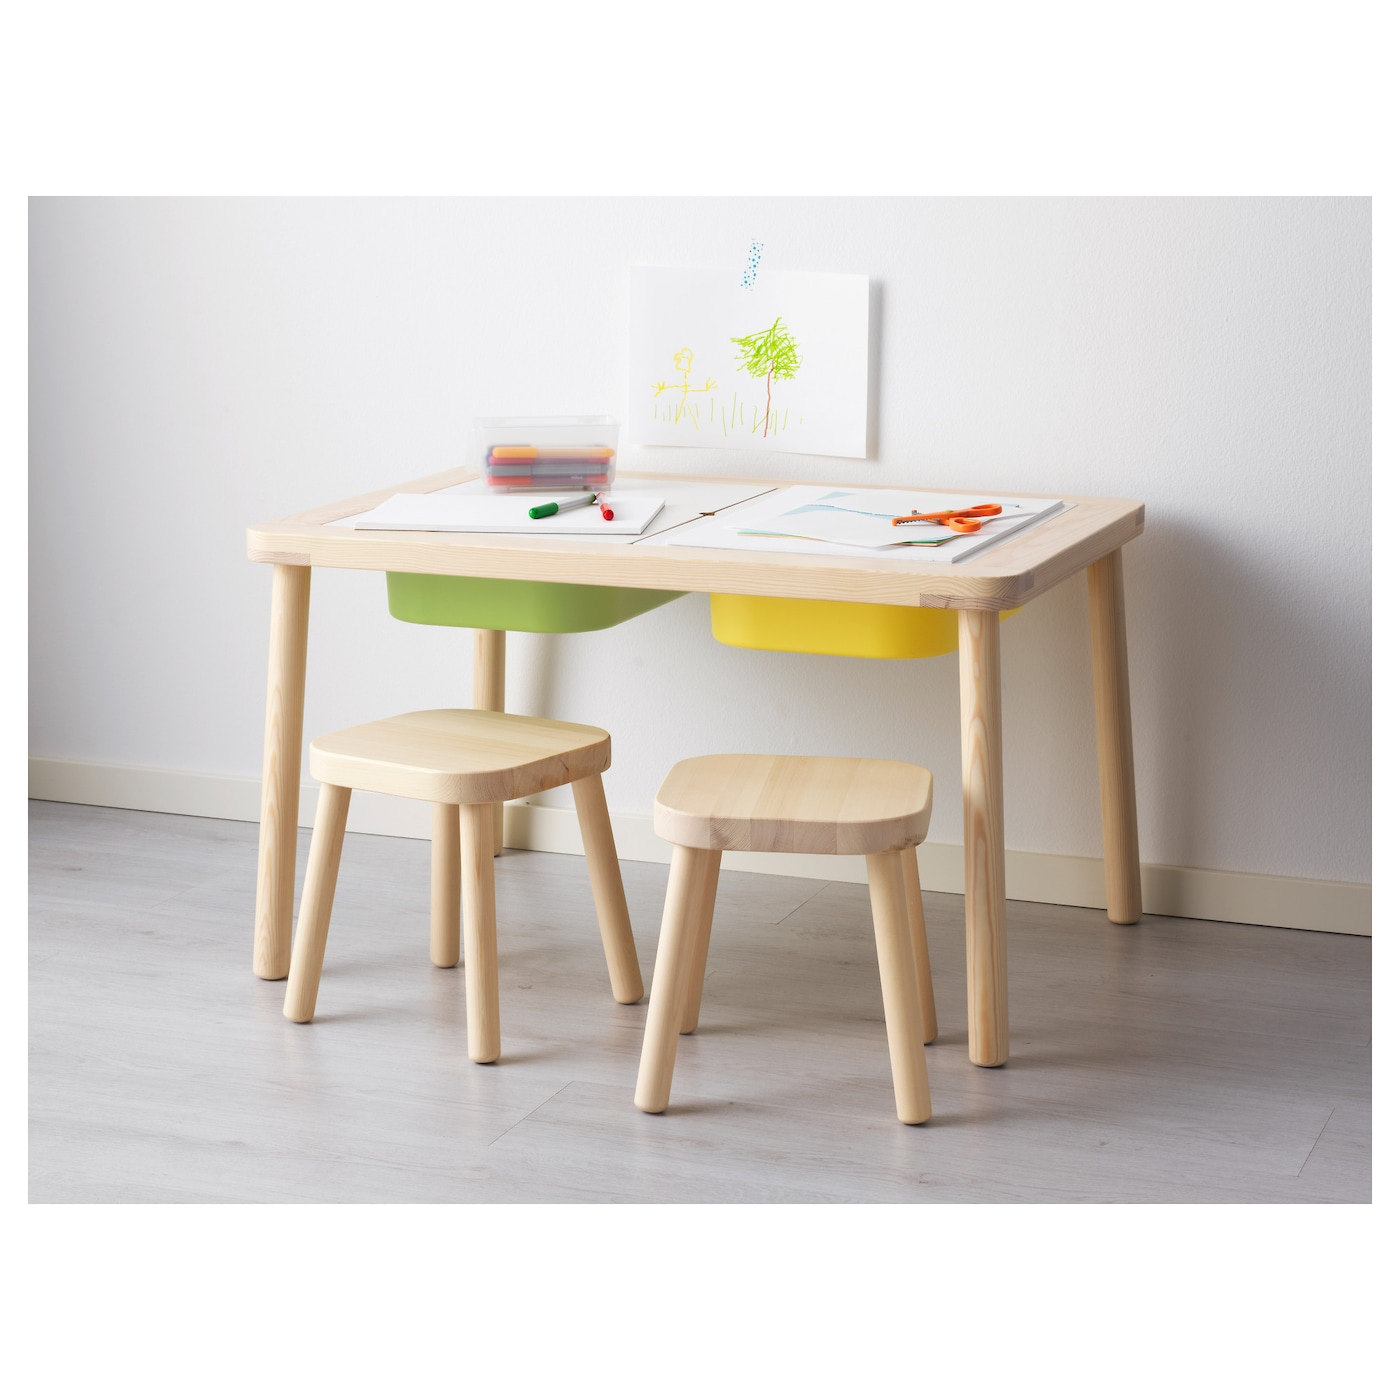 Picture of: Flisat Children S Table 32 5 8×22 7 8 Ikea